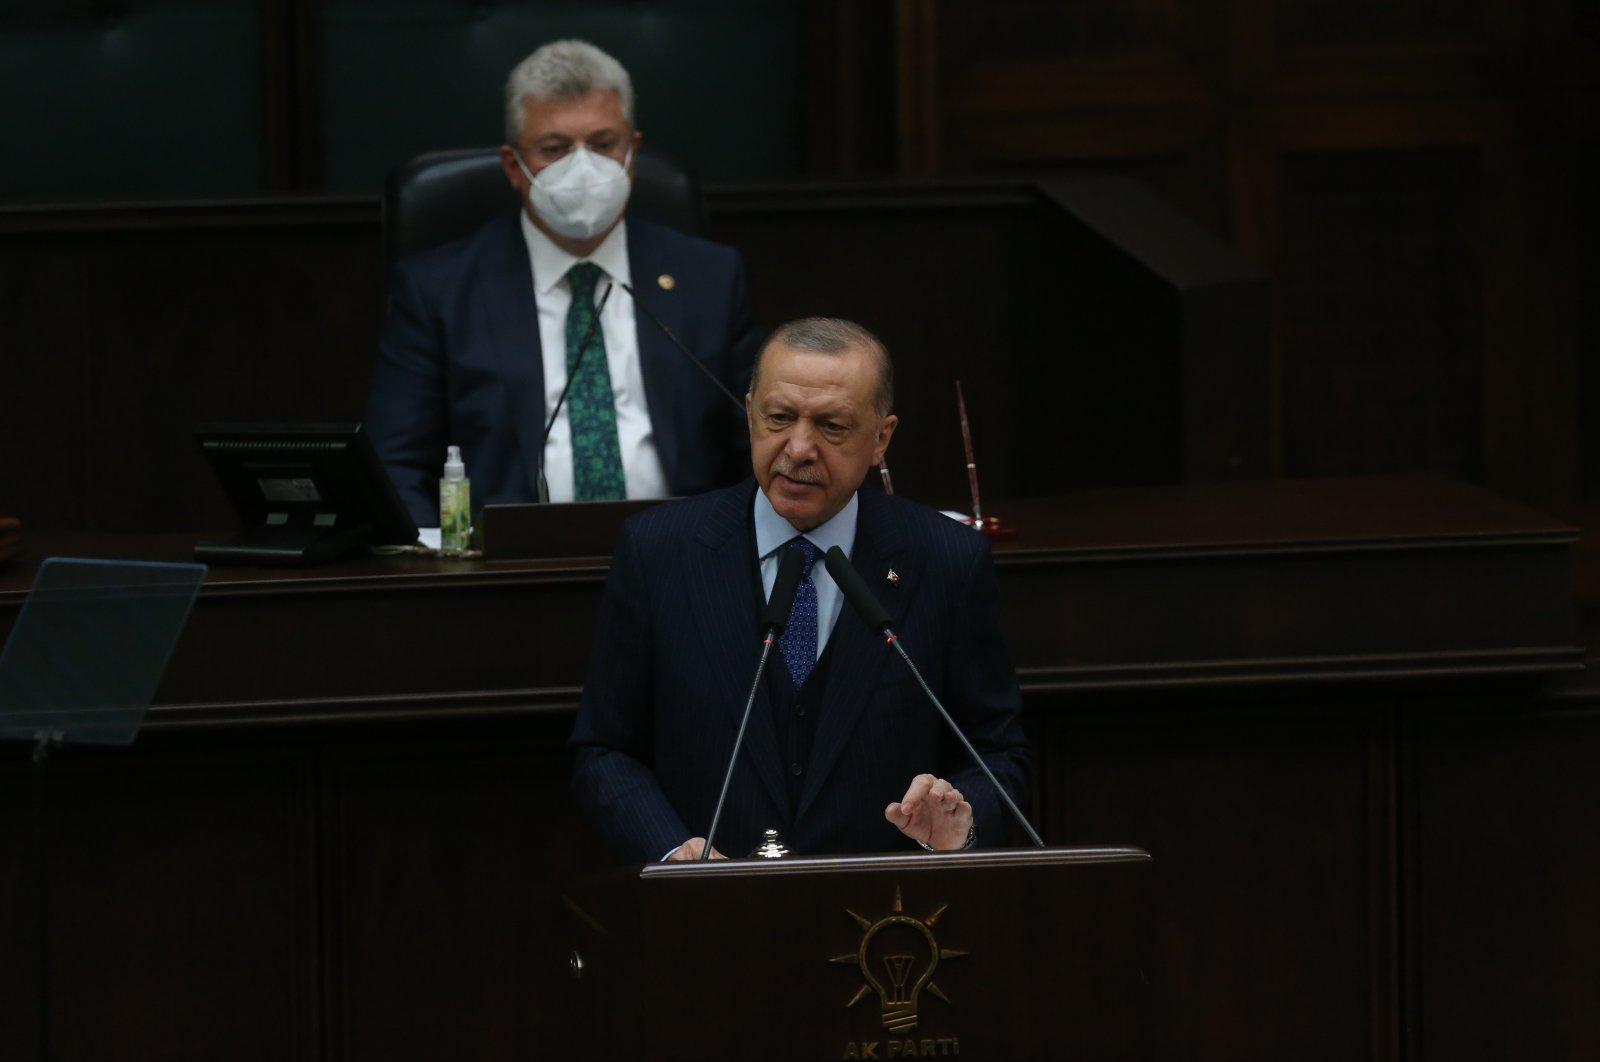 President Recep Tayyip Erdoğan speaks at the AK Party's parliamentary group meeting in Ankara, Turkey, Wednesday, Oct. 6, 2021. (IHA Photo)